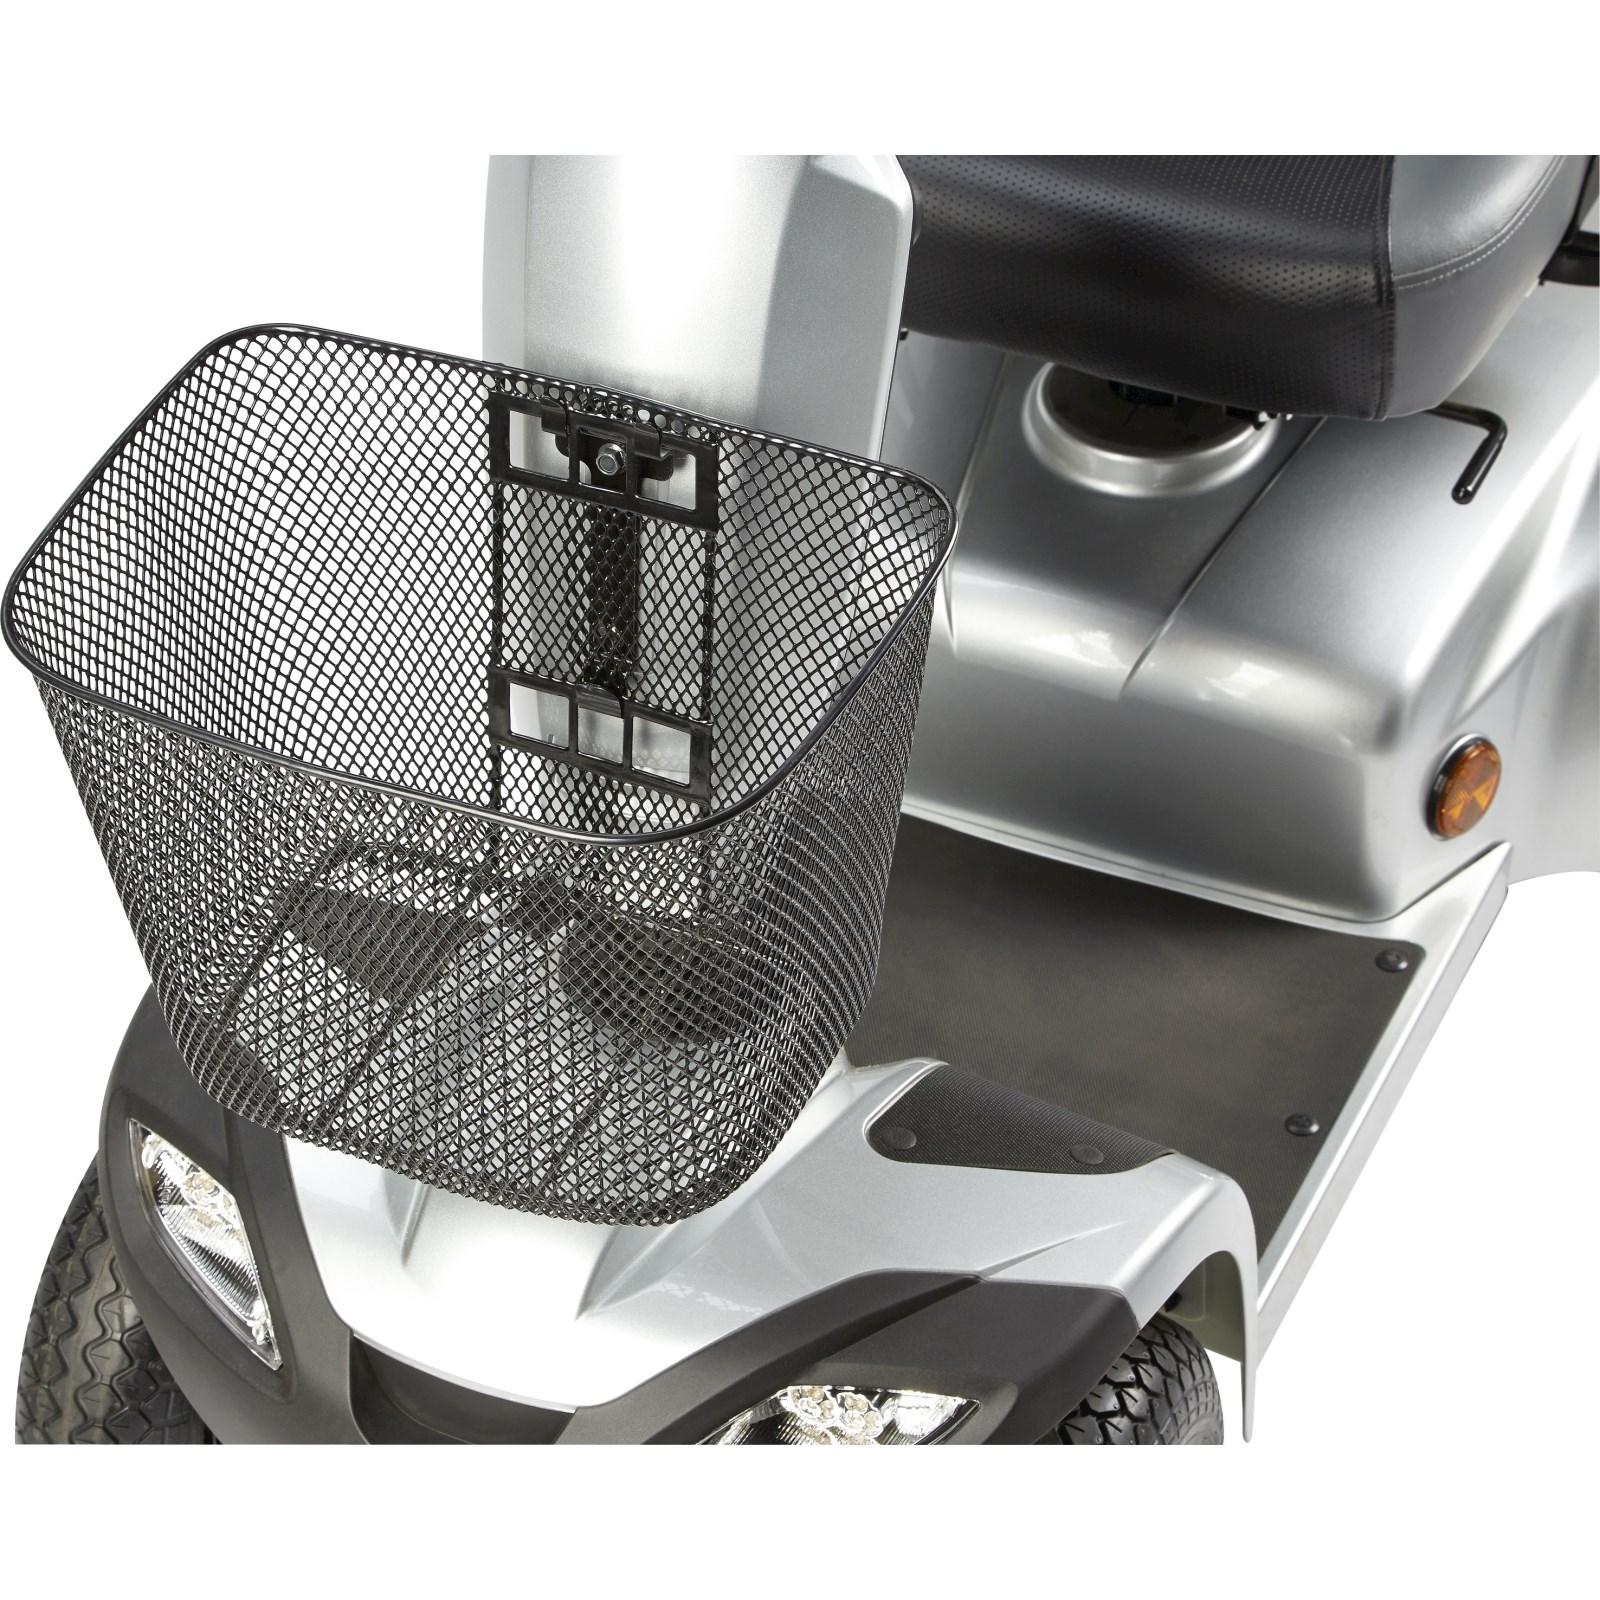 elektromobil hs 559 mobil comfort seniorenfahrzeug. Black Bedroom Furniture Sets. Home Design Ideas